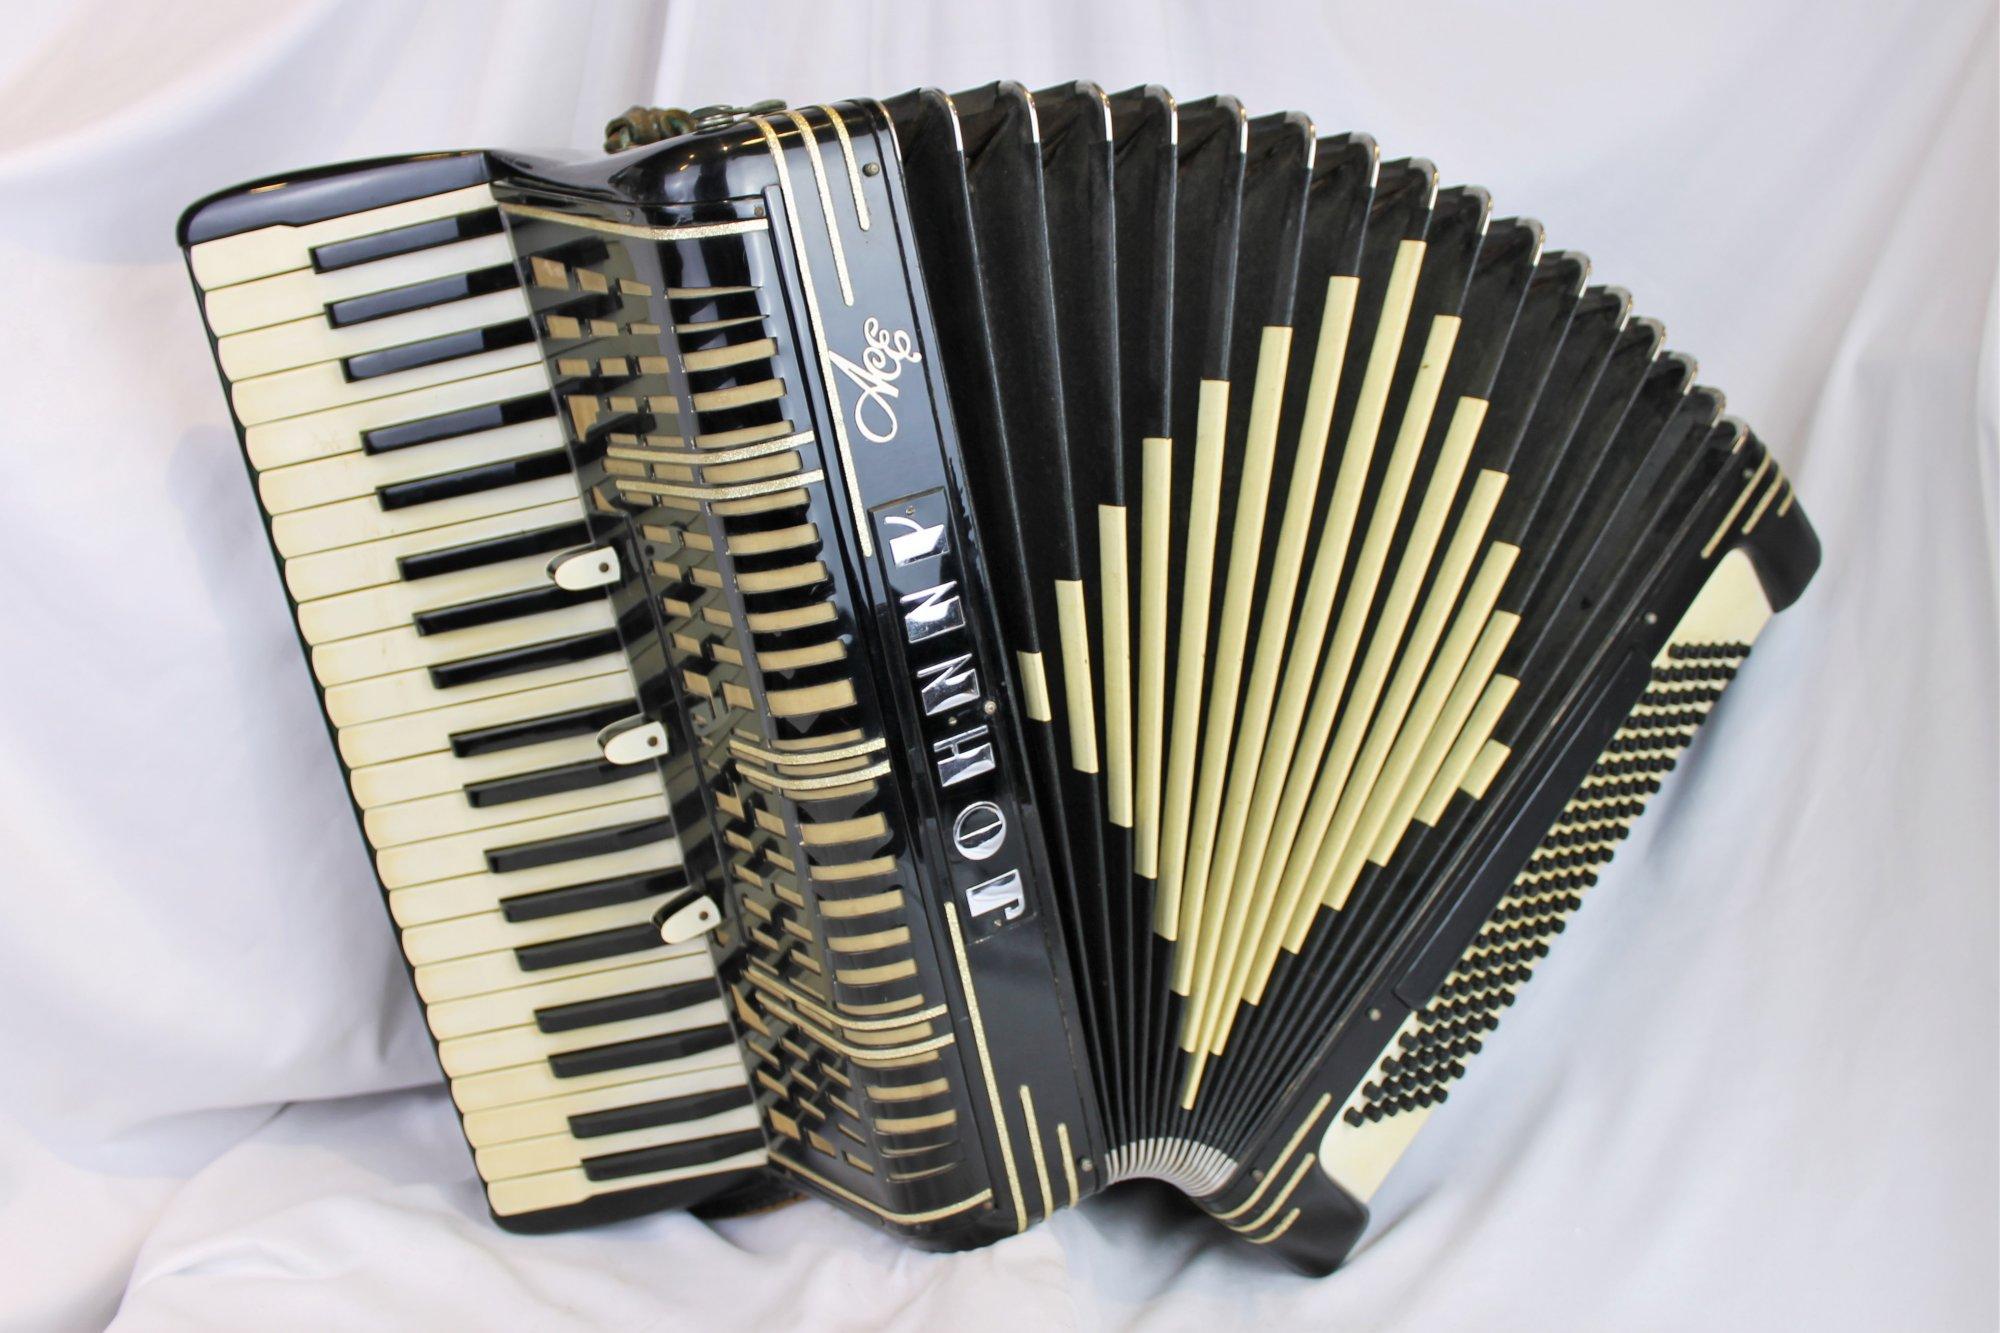 4337 - Black Ace 70 Johnny Piano Accordion LMM 41 120